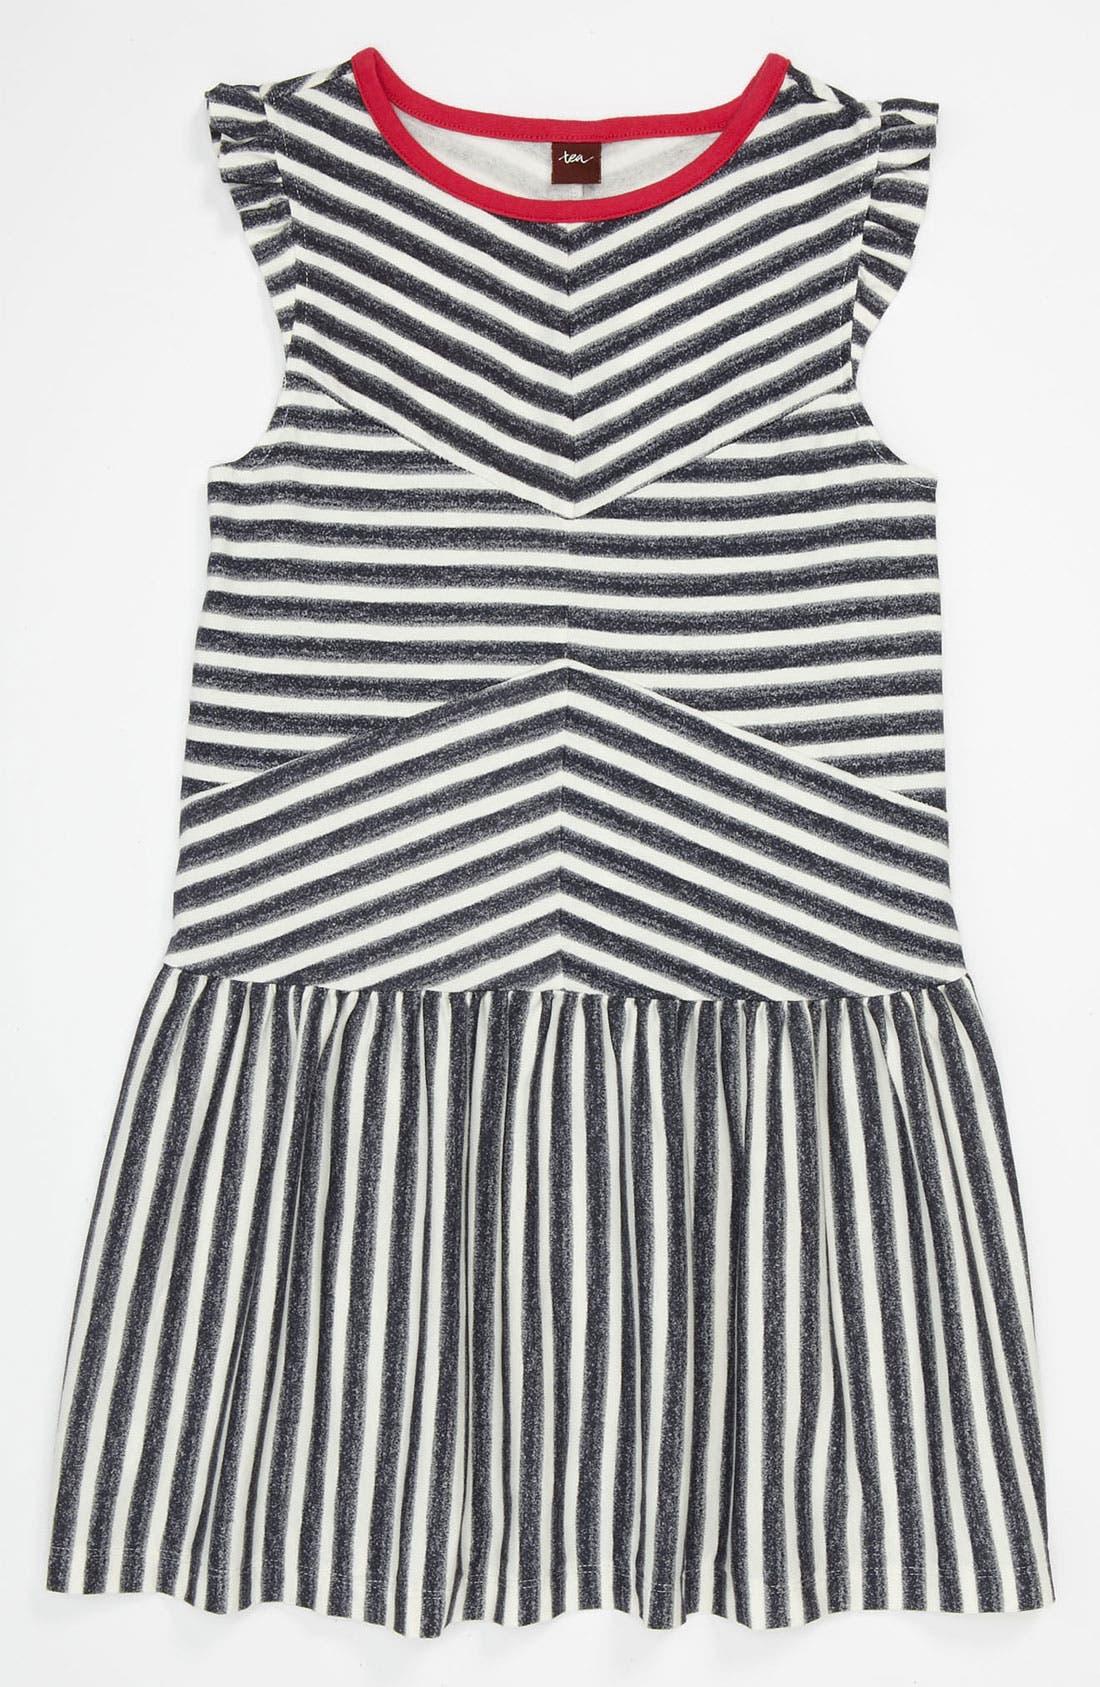 Alternate Image 1 Selected - Tea Collection 'Zebra Stripe' Flutter Dress (Toddler, Little Girls & Big Girls)